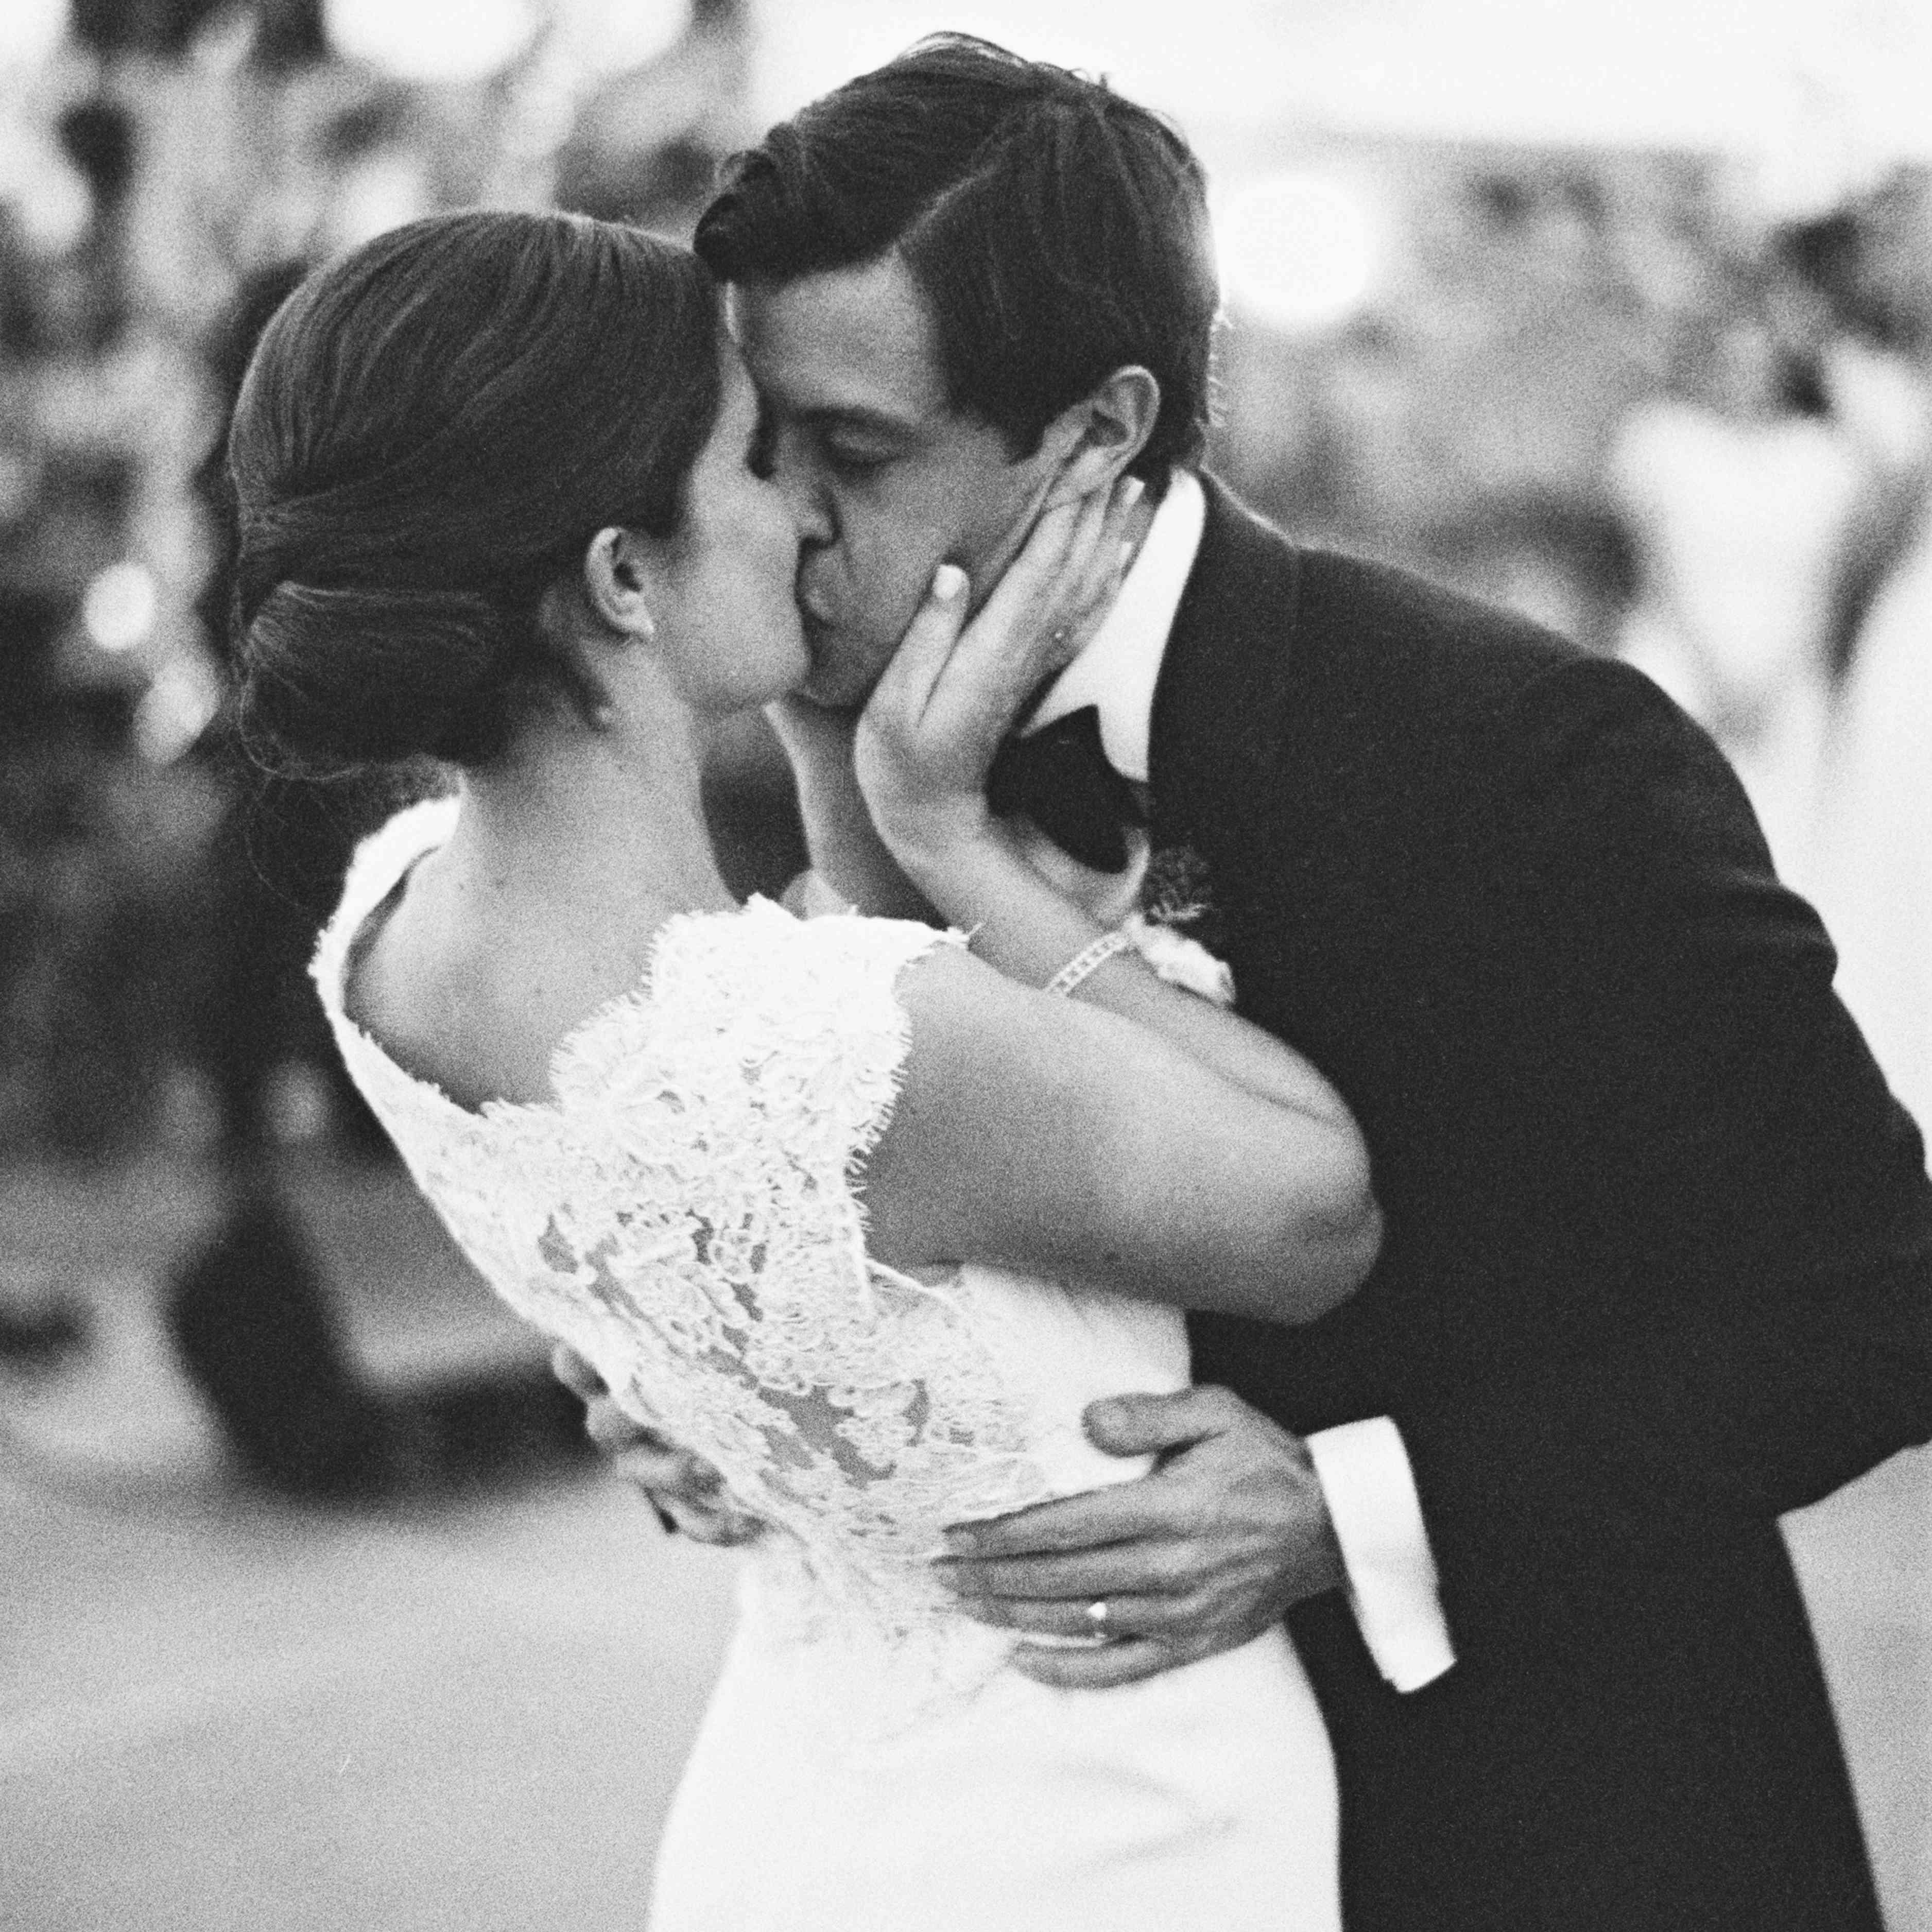 kiss on dance floor